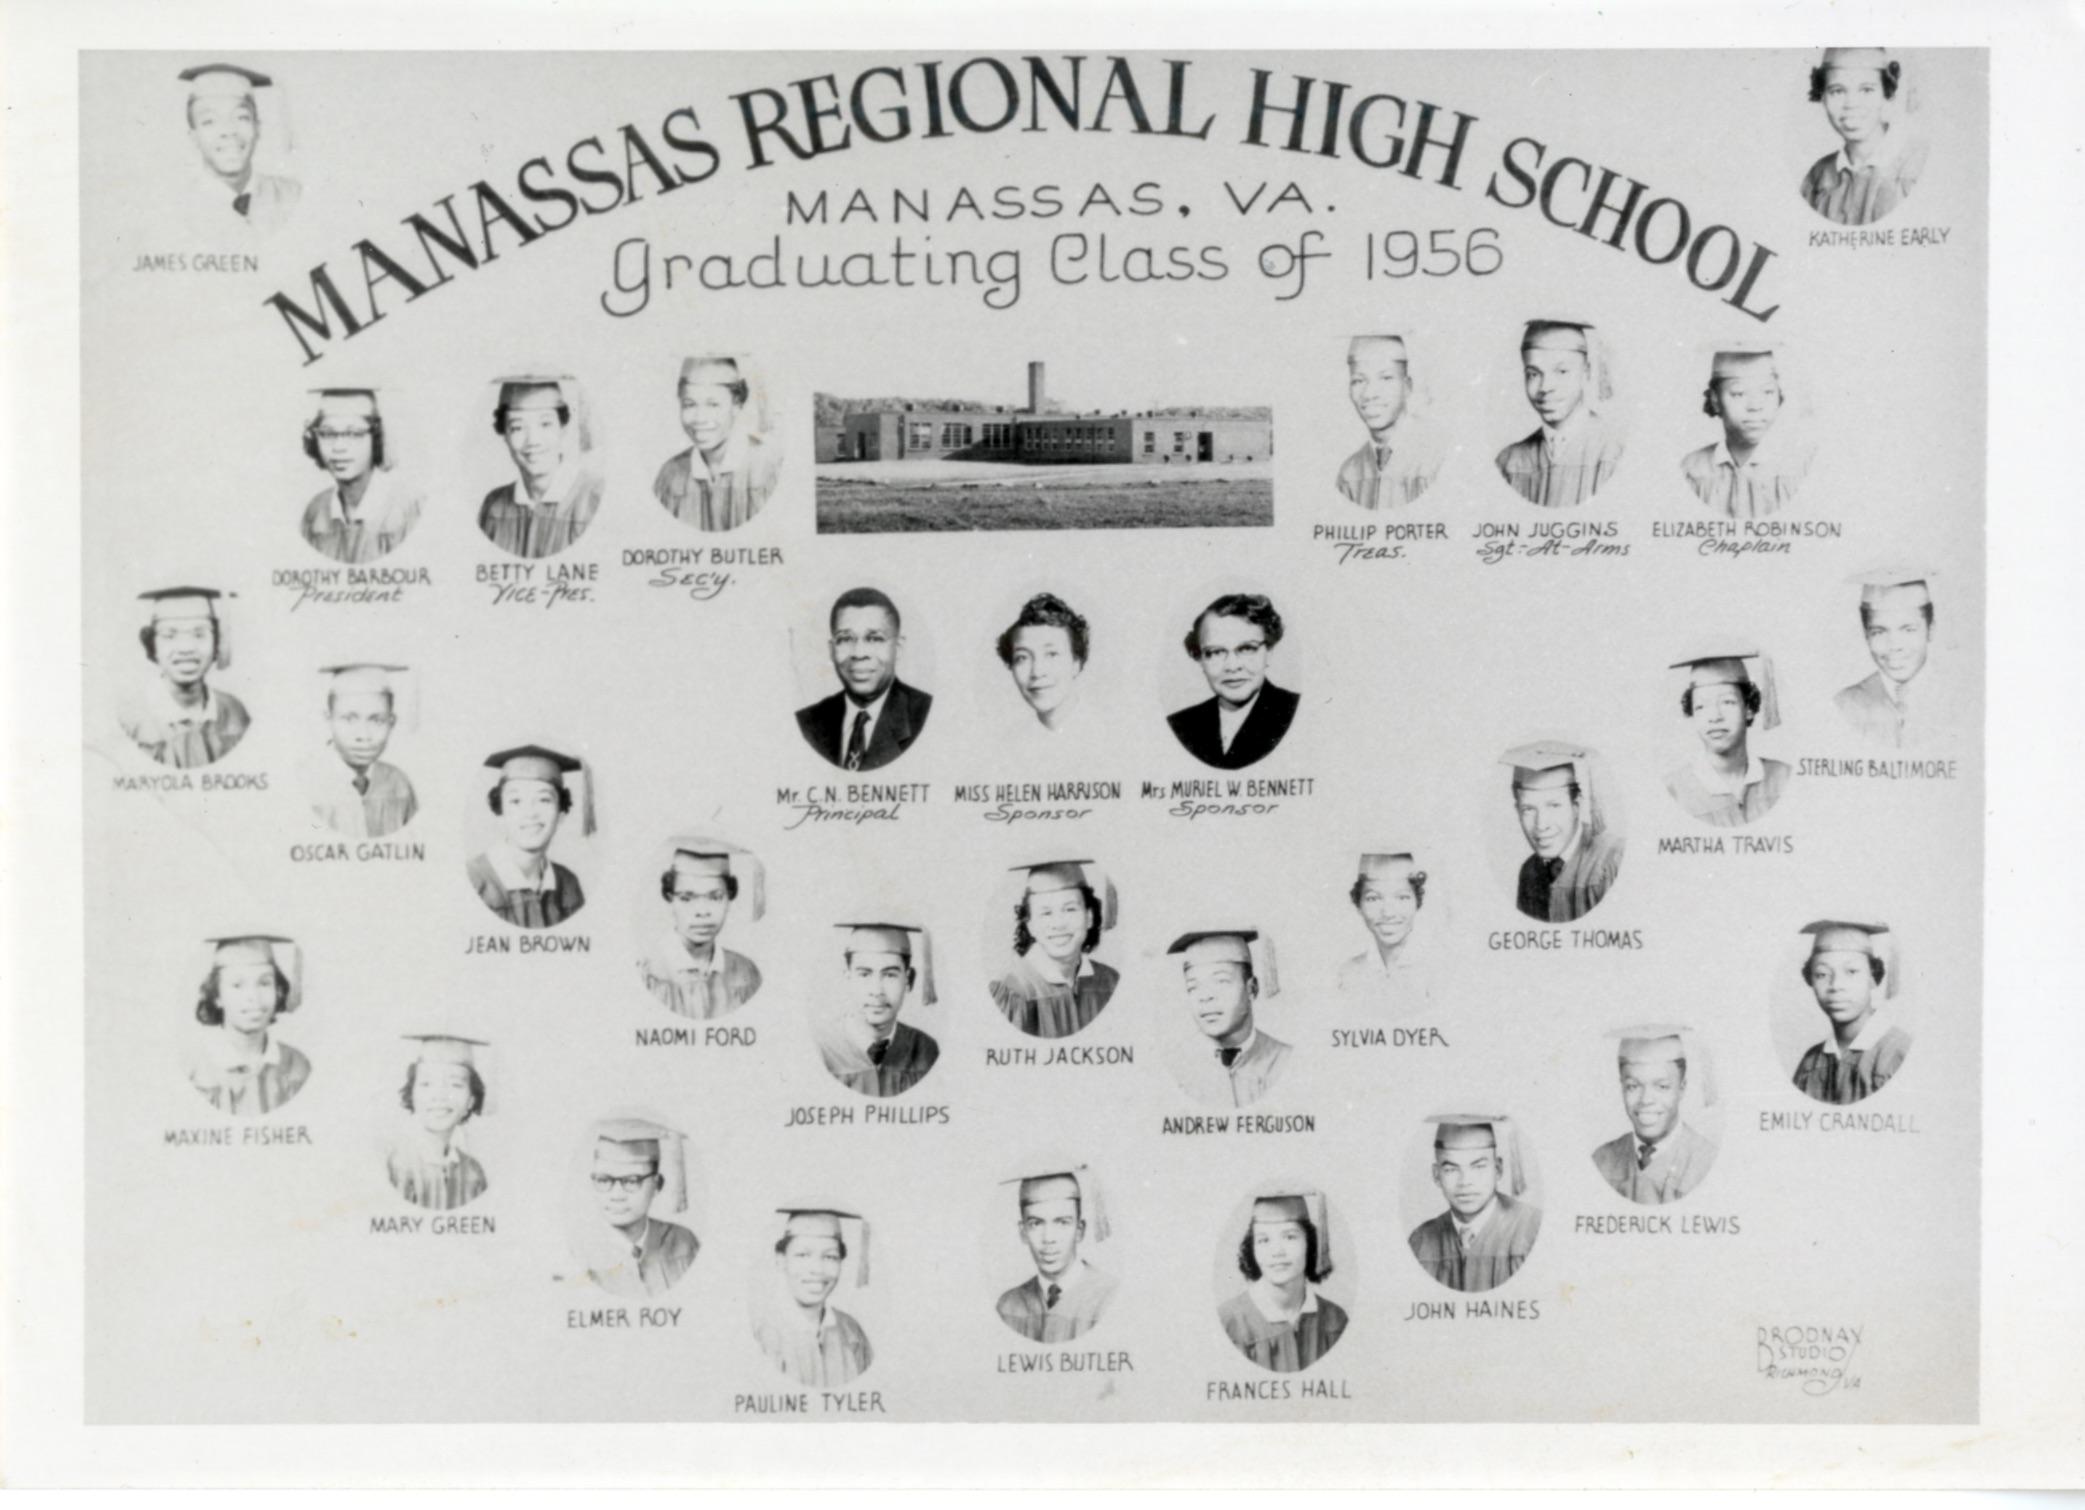 Manassas Regional HS - graduating class of 1956